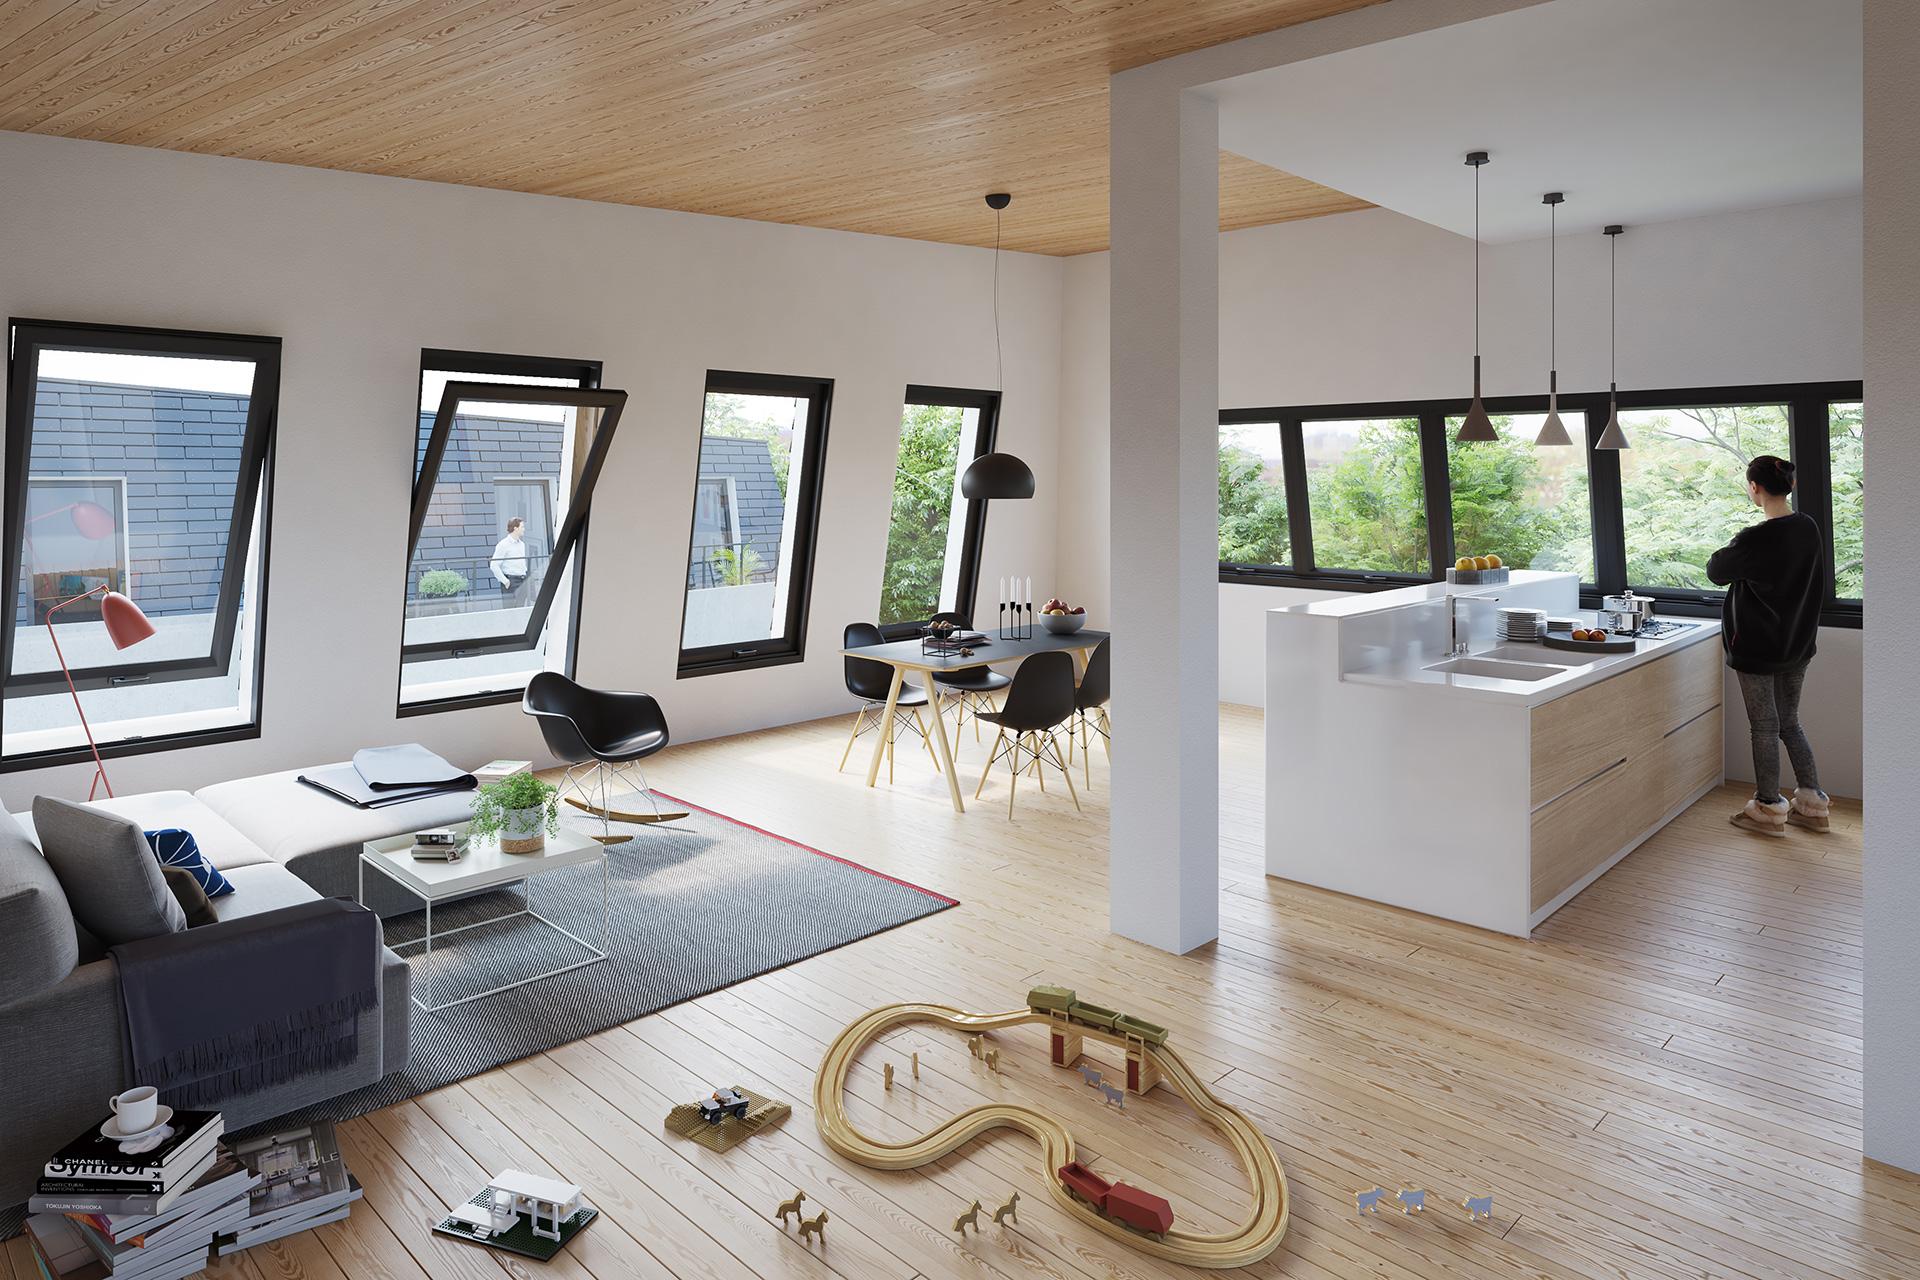 14 Komfortable Eigentumswohnungen in Berlin Zehlendorf